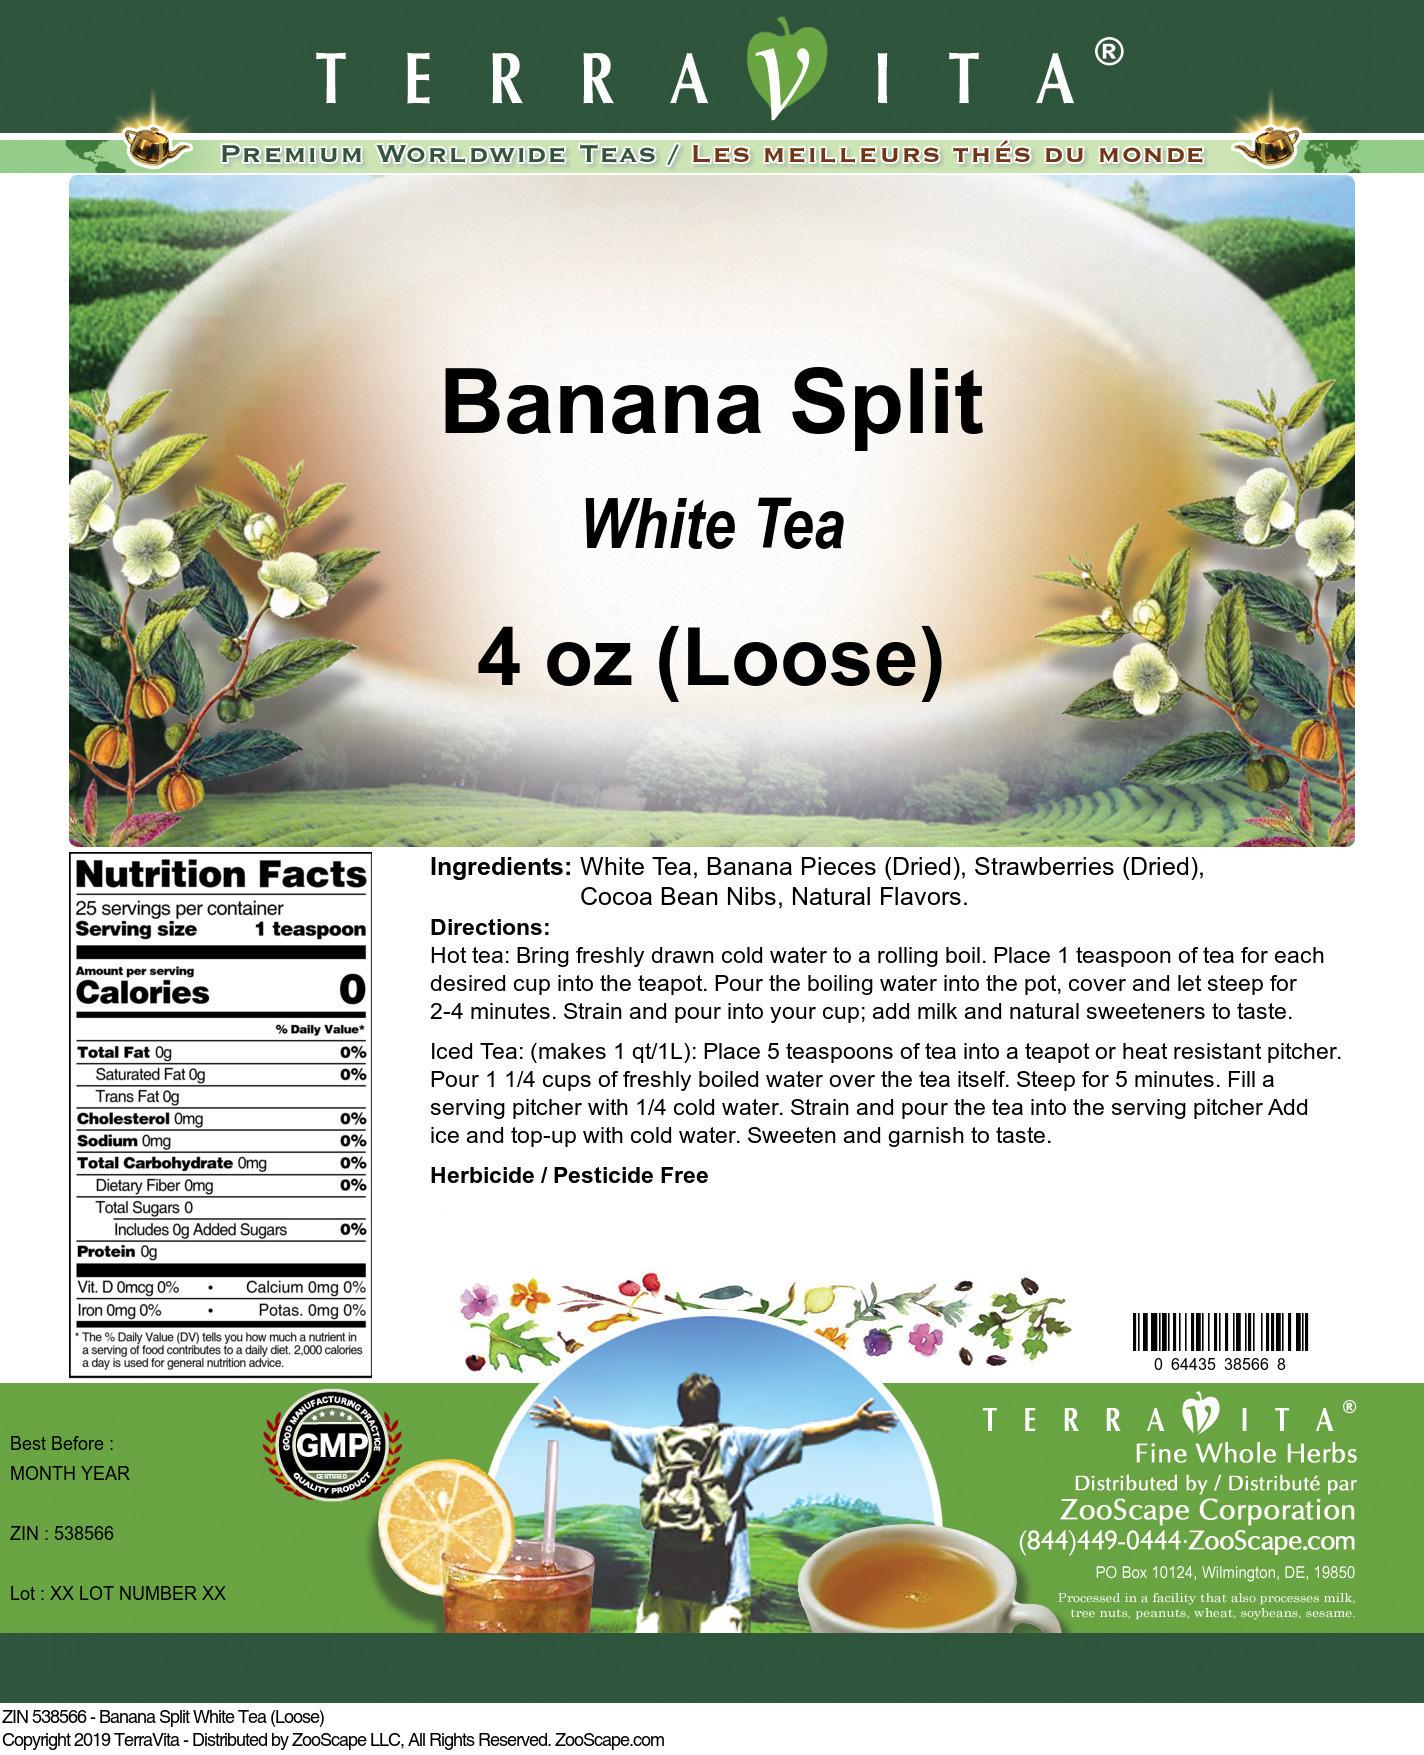 Banana Split White Tea (Loose)